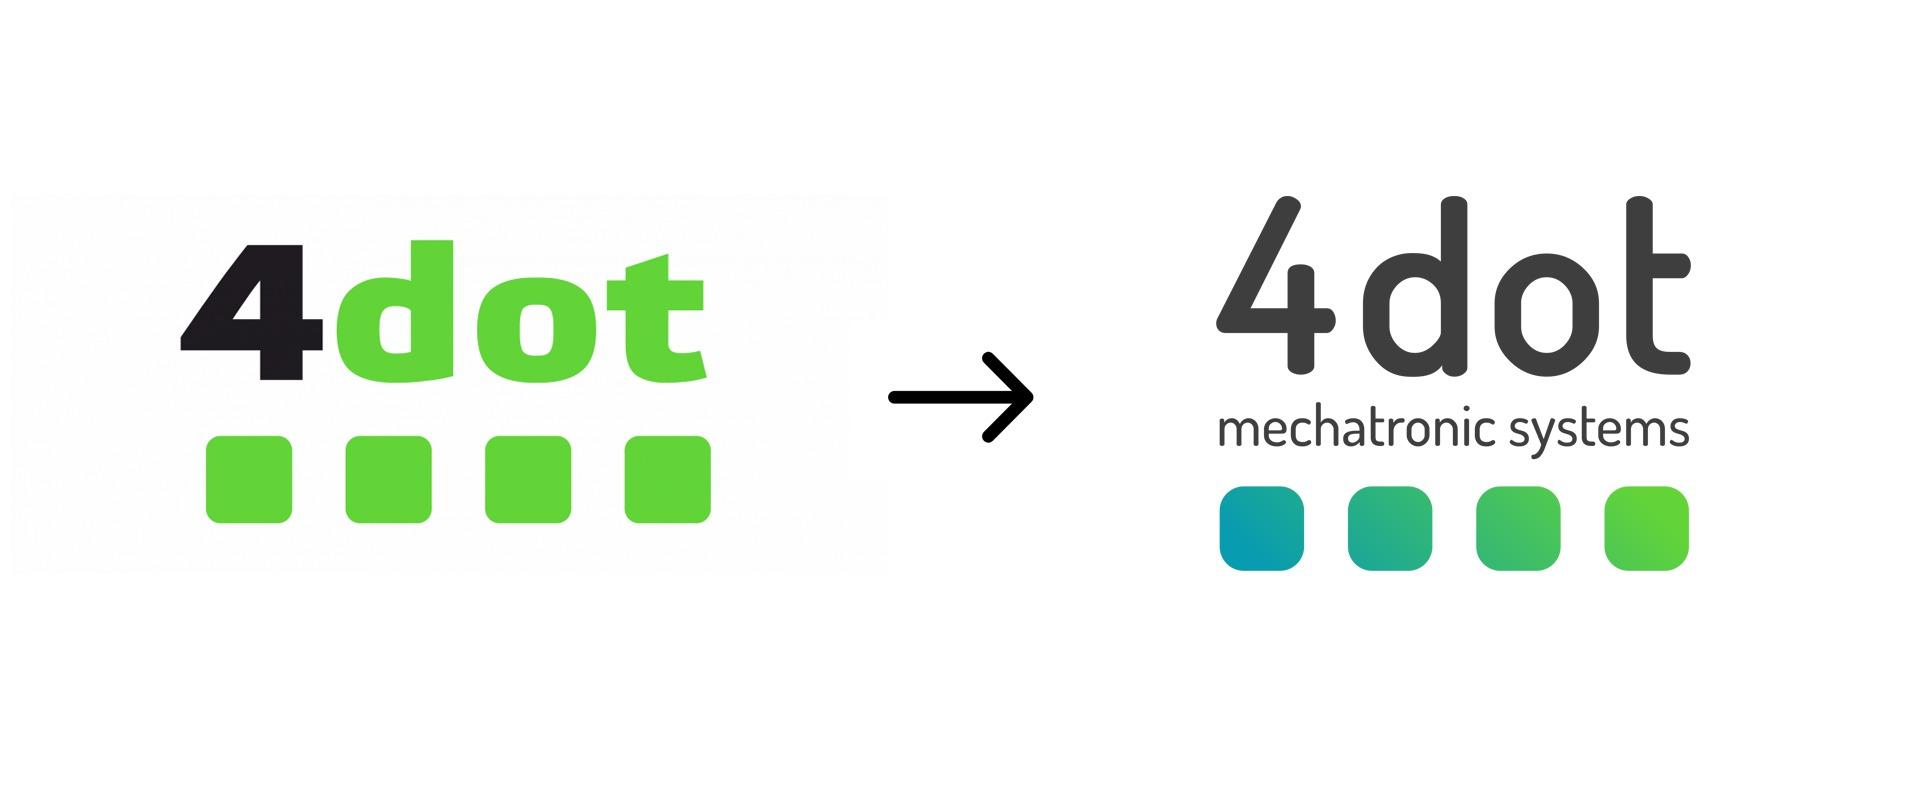 4dot logo redesign